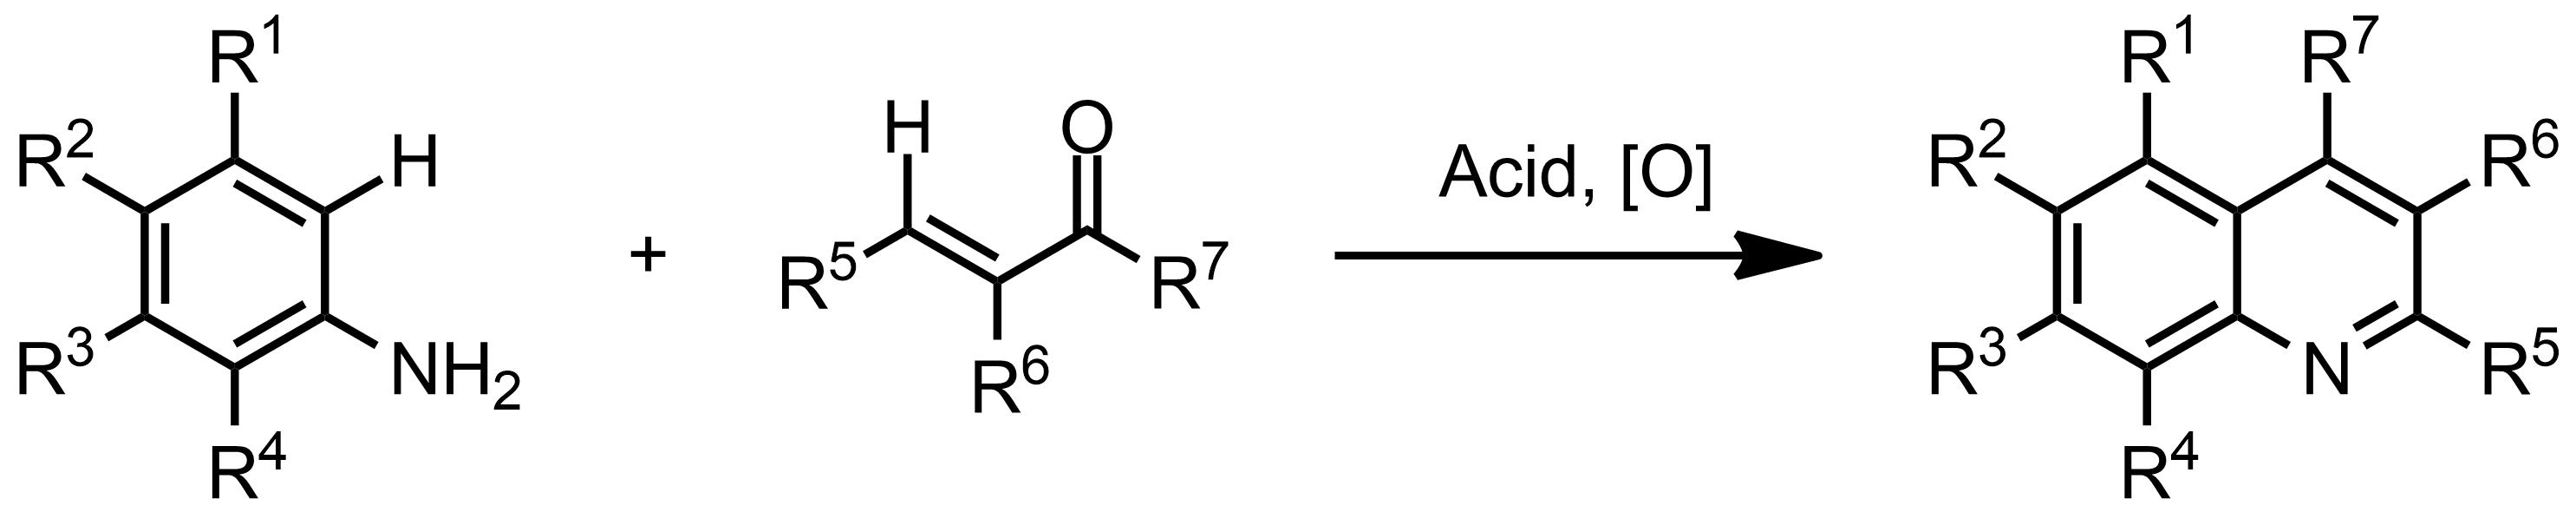 Schematic representation of the Doebner-Miller Reaction.